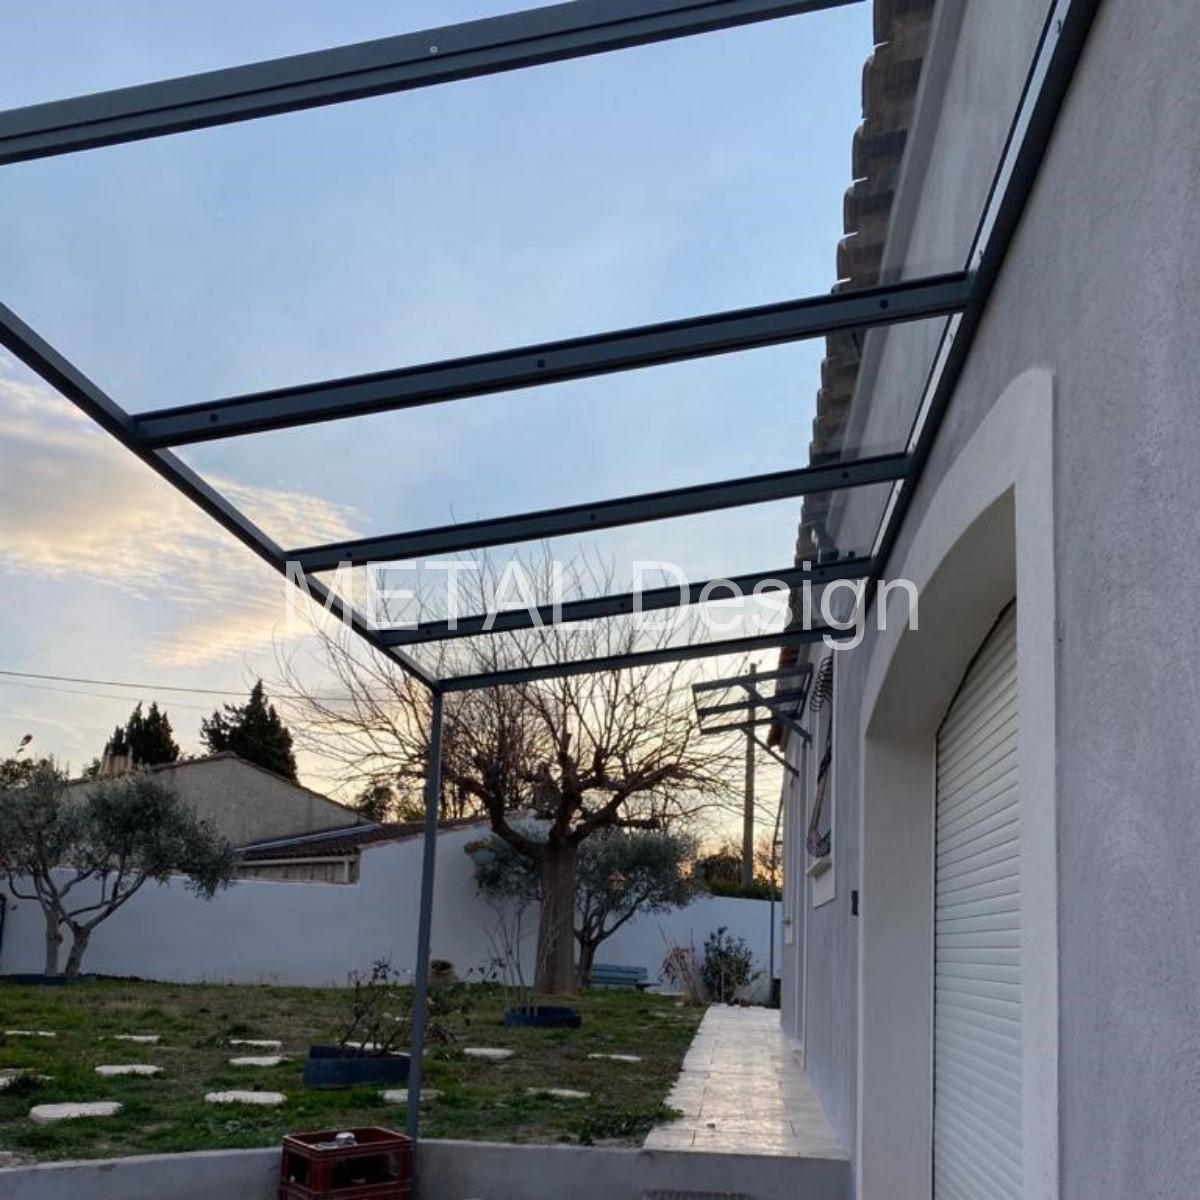 Installation de pergola vitrée à Salon de Provence 13